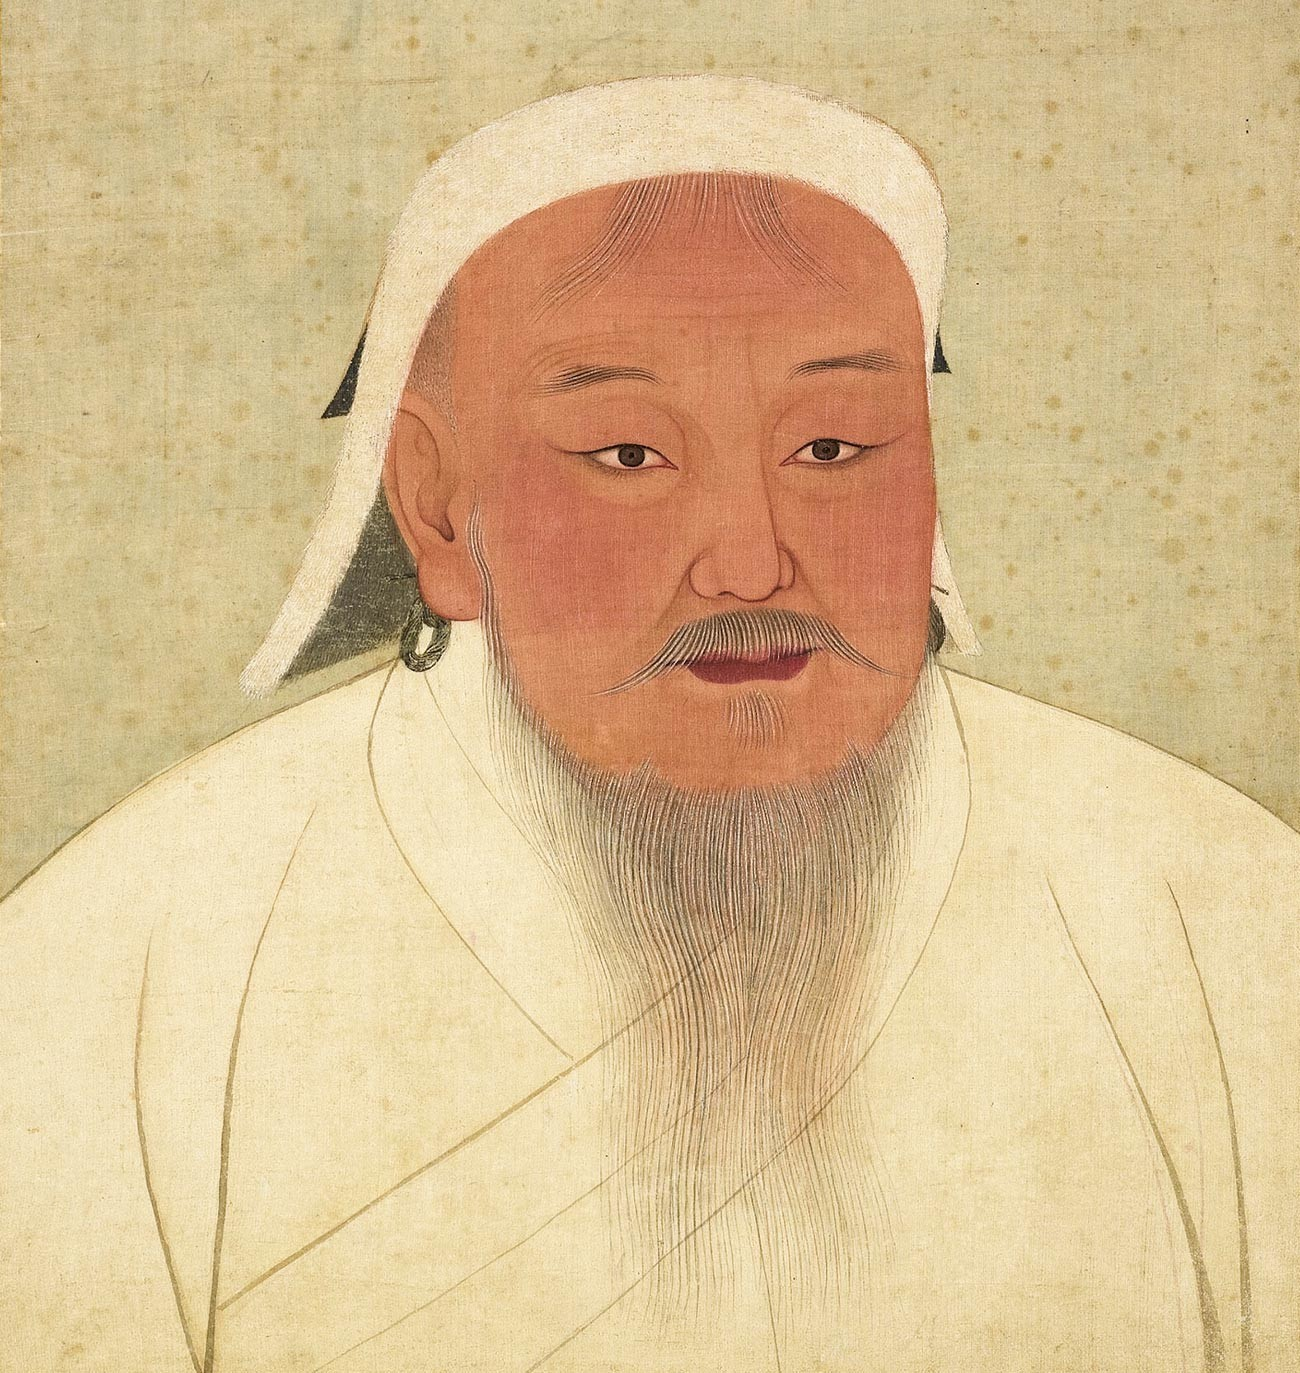 Џингис Хан